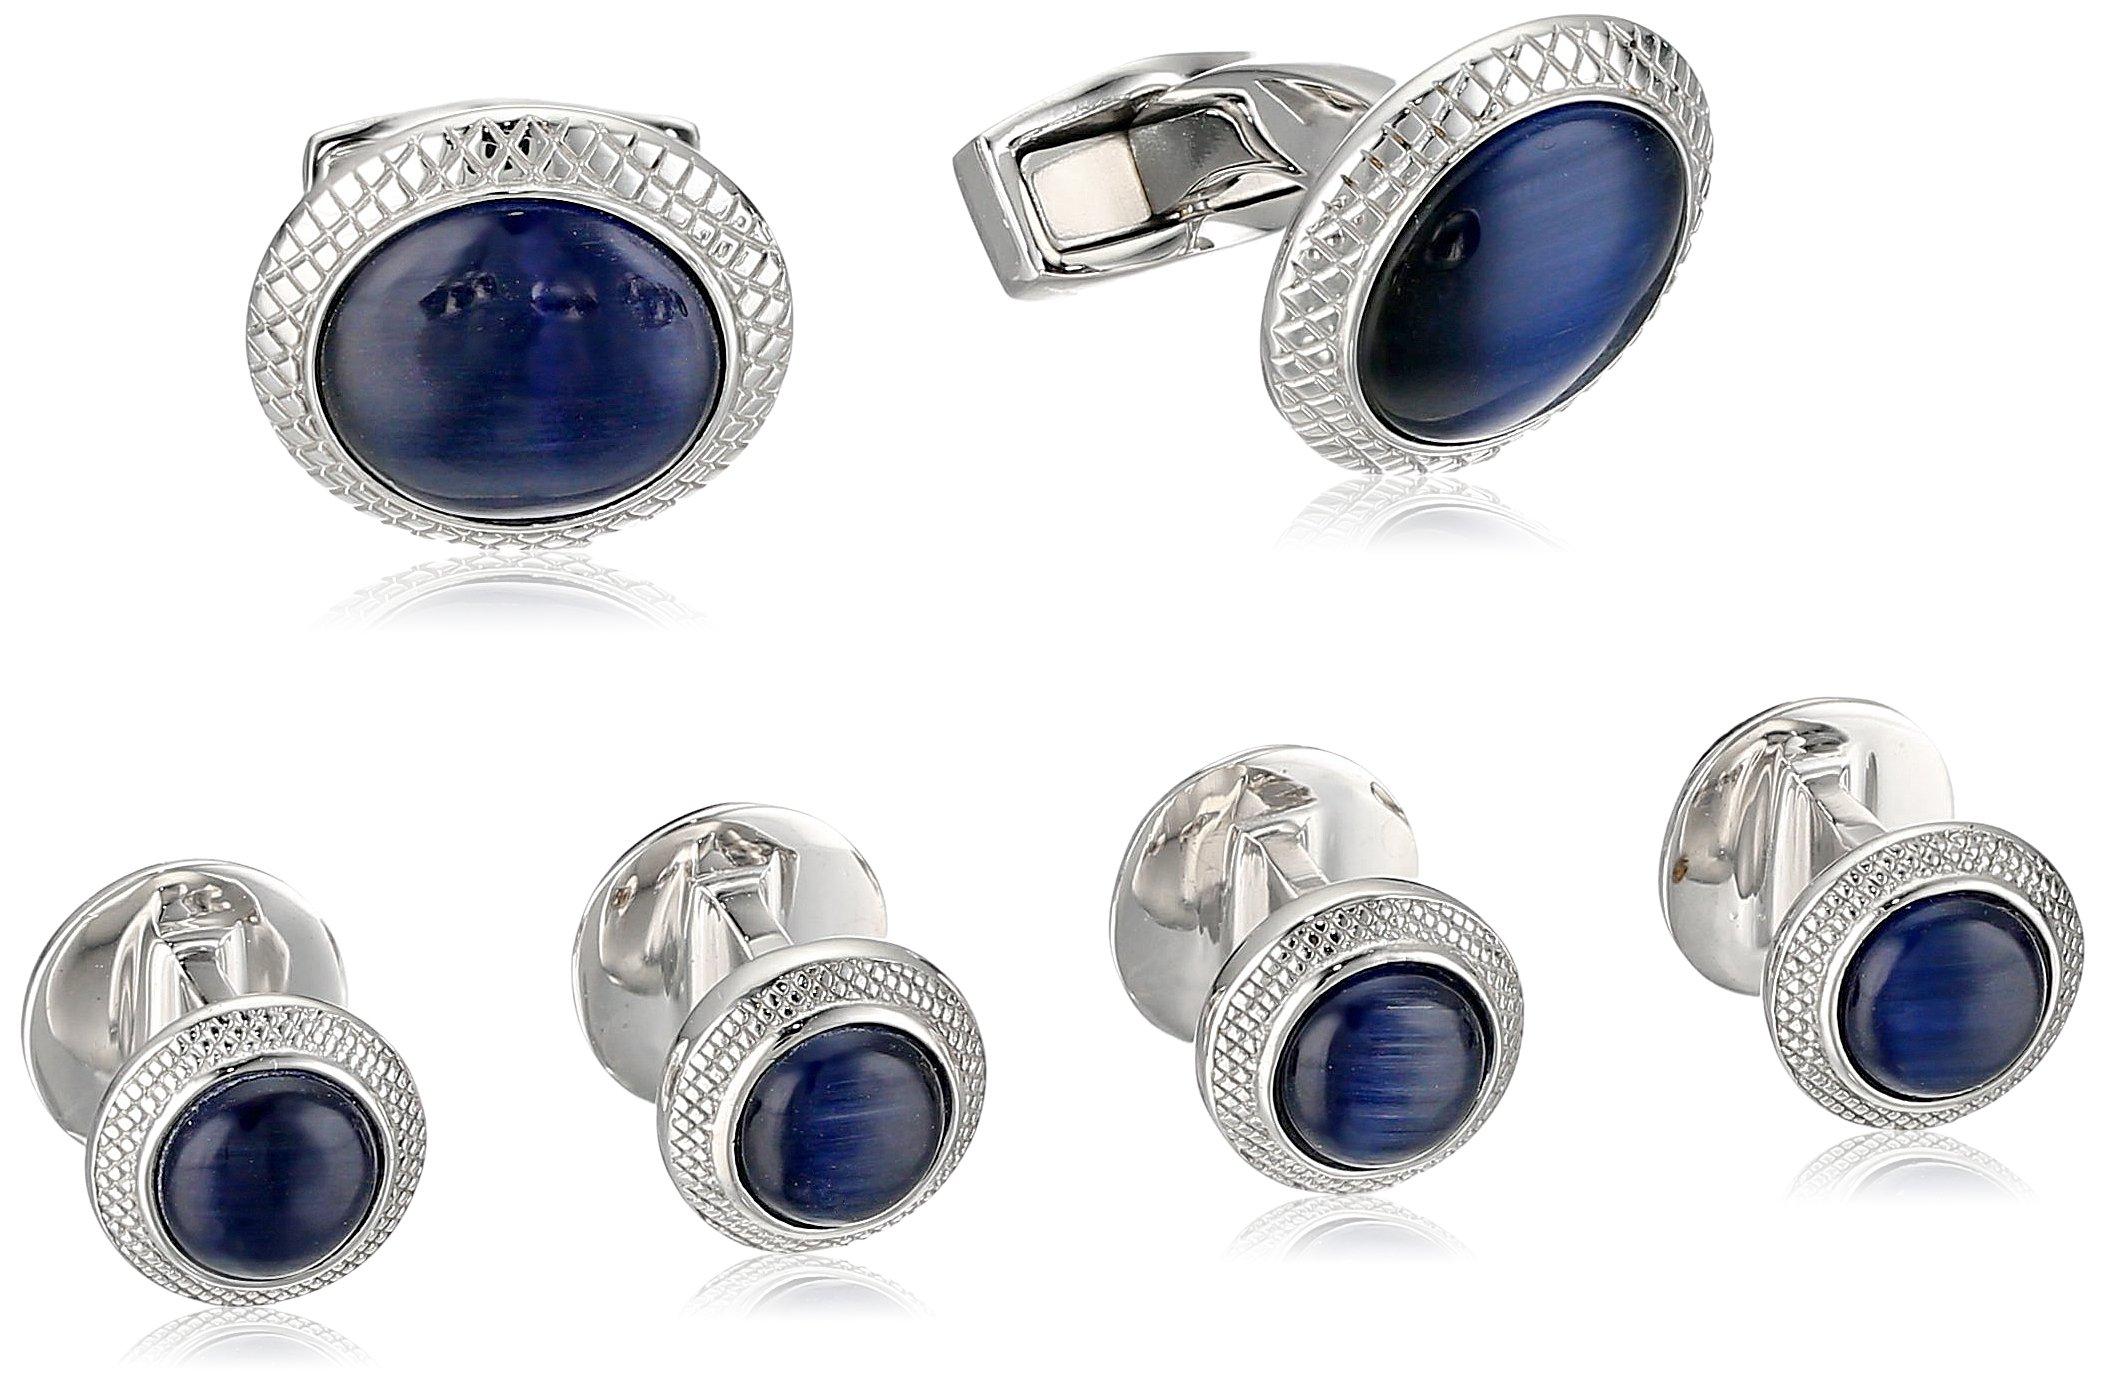 Tateossian Rhodium Plating Fiber Optic Glass Blue Cuff Link and Shirt Stud by Tateossian